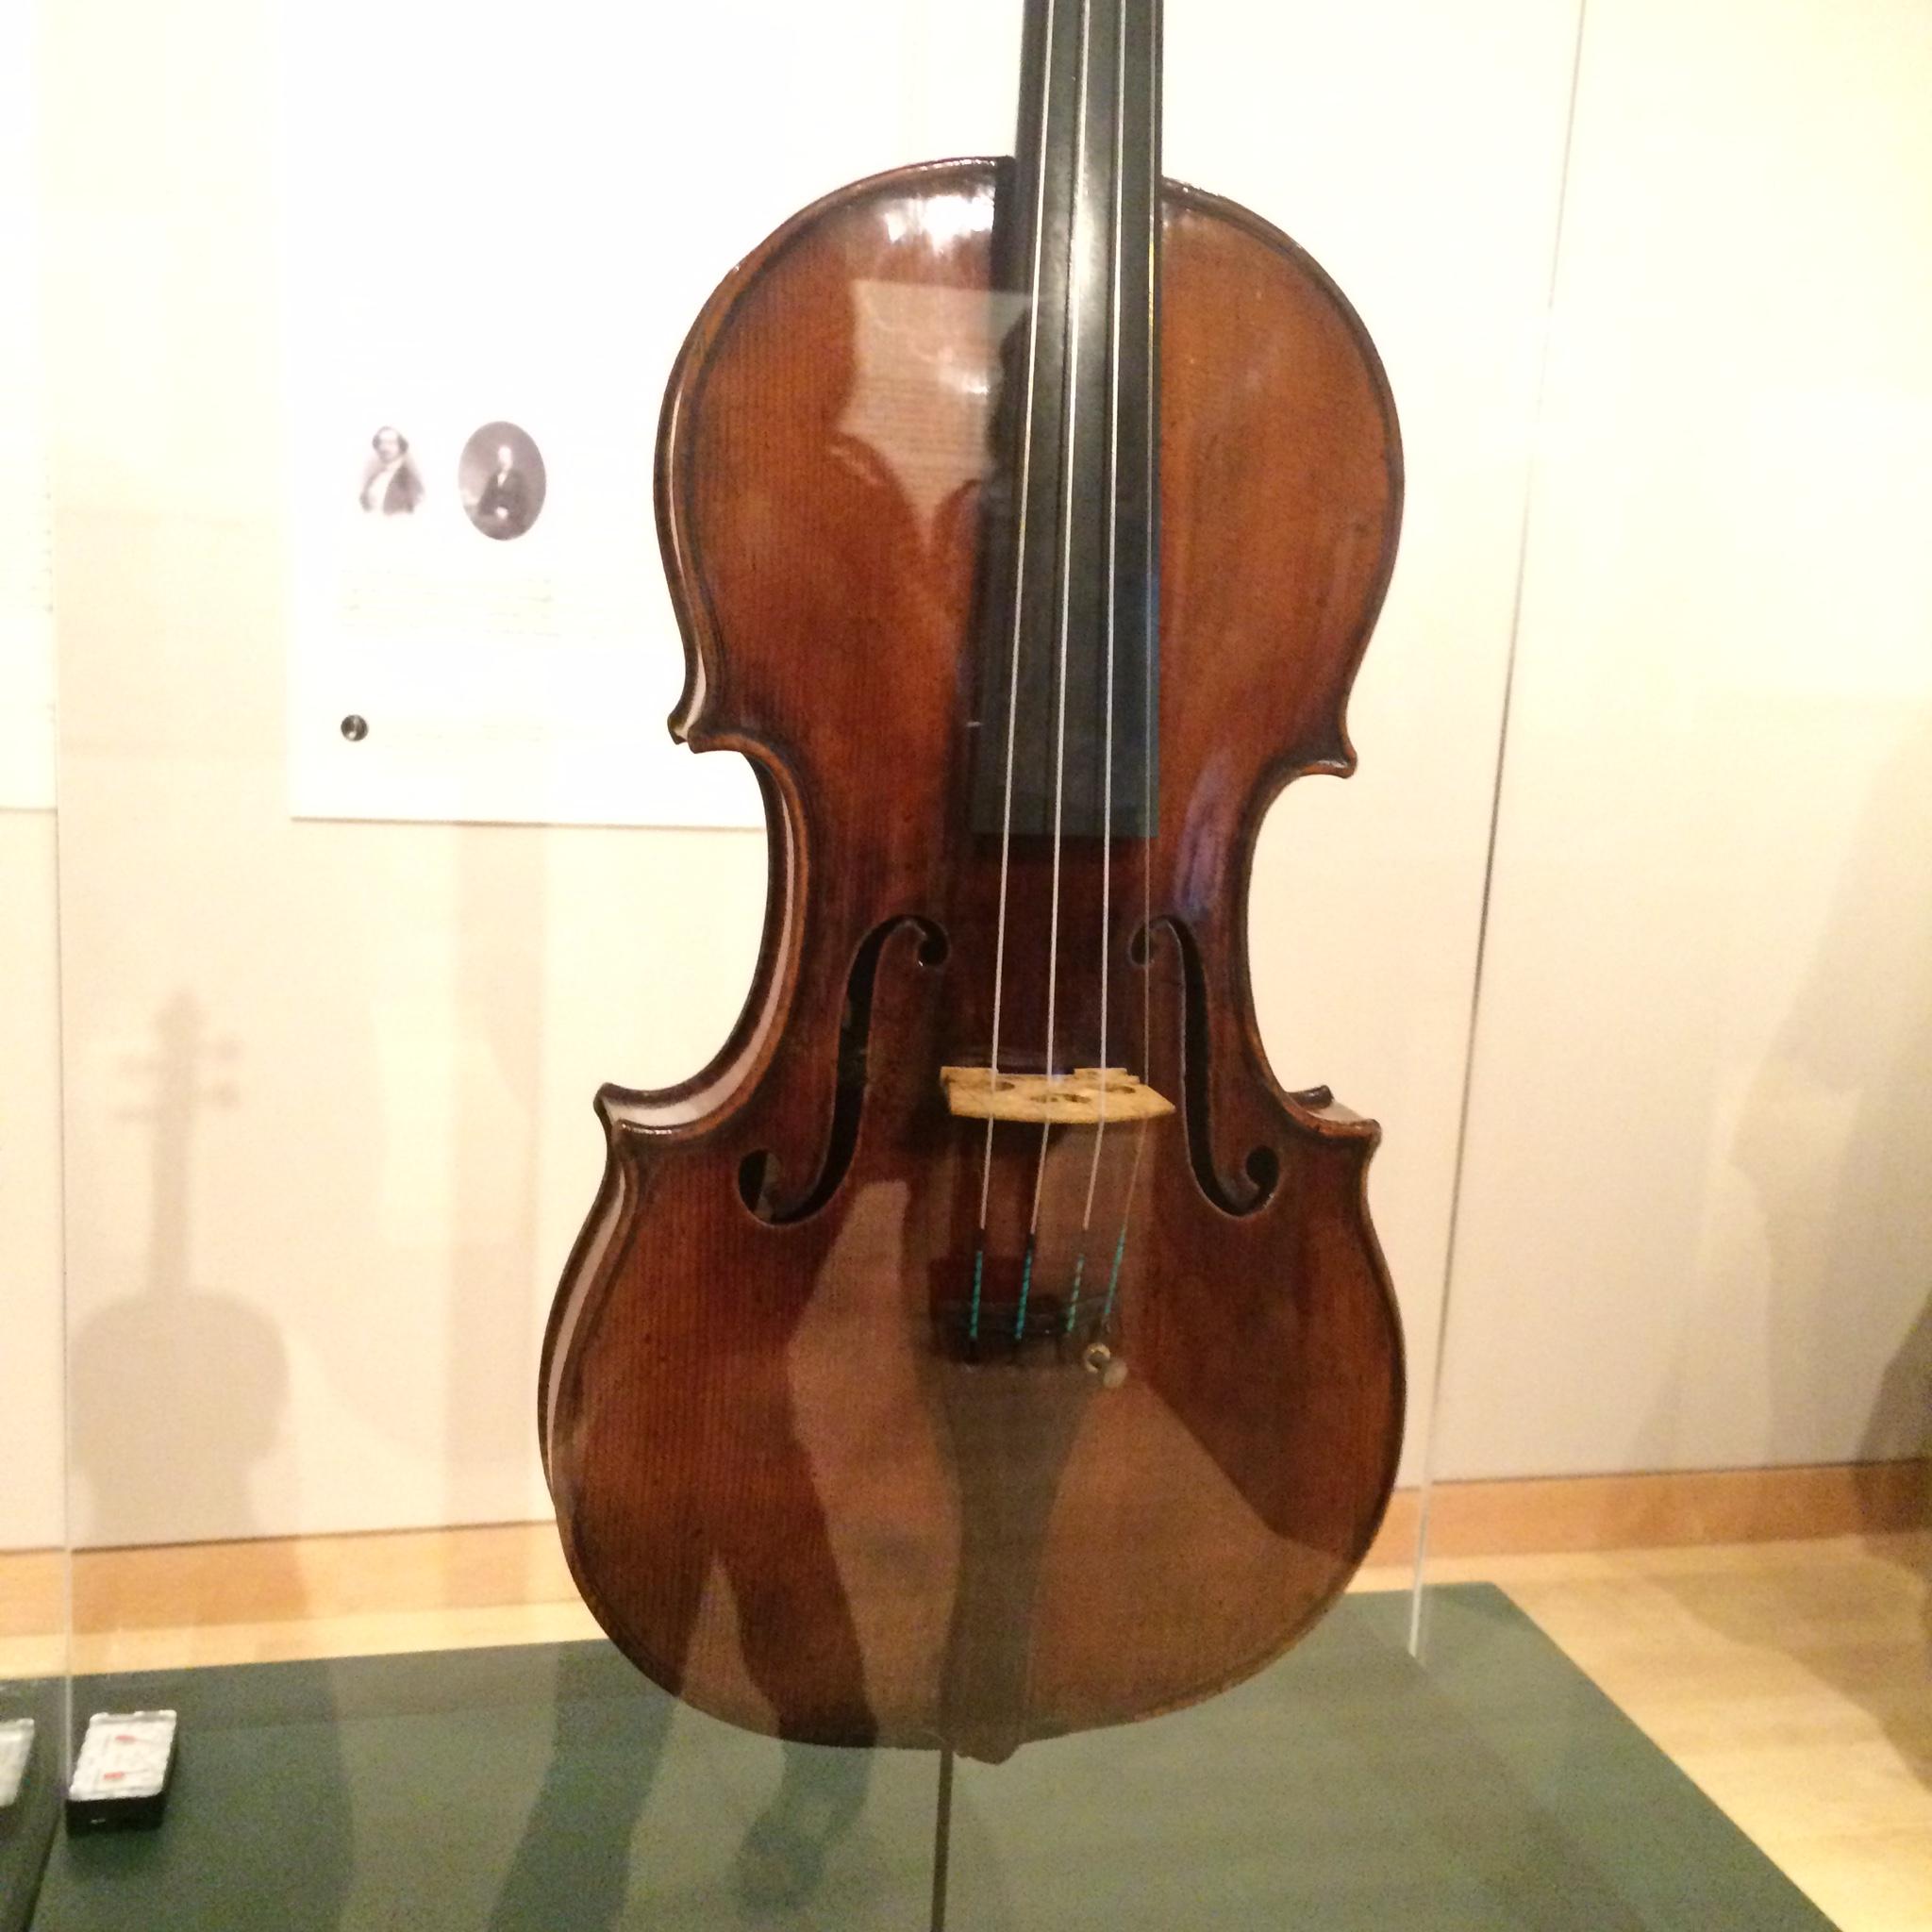 1728 'Artôt-Alard' Stradivari